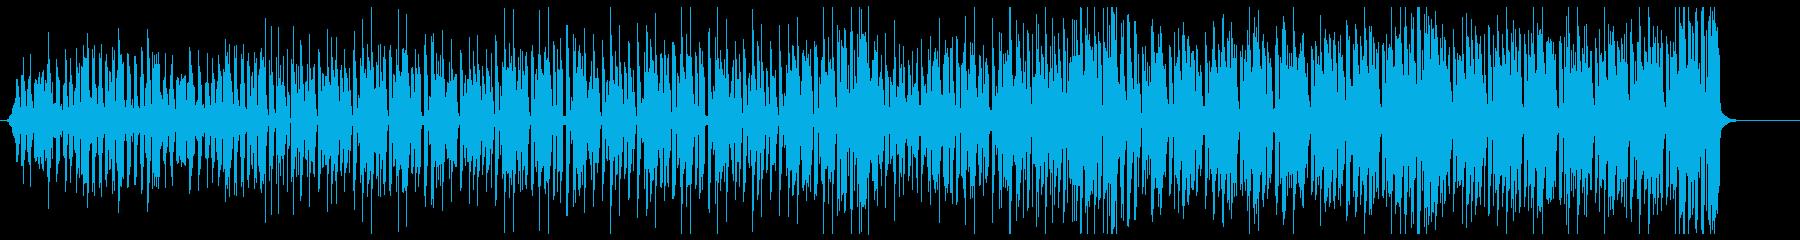 K-POP、EDM、ディスコ bの再生済みの波形